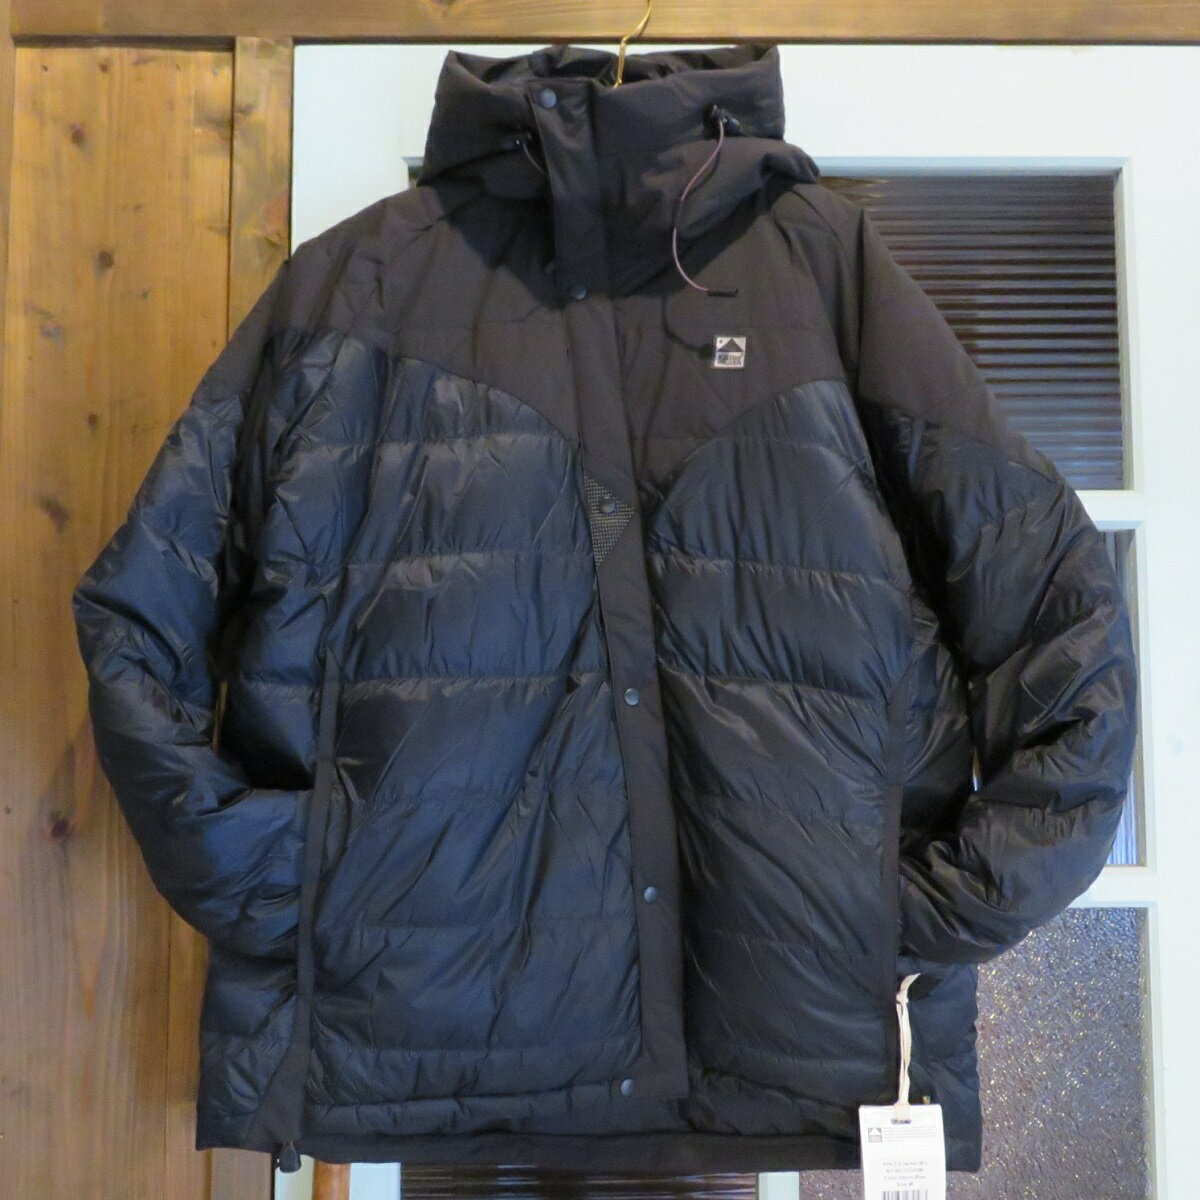 KLATTERMUSEN(クレッタルムーセン) Atle2.0 Jacket M's StormBlue Mサイズ 【アトレ2.0ジャケット】 【ダウンジャケット】【正規輸入品】【アウトドア】